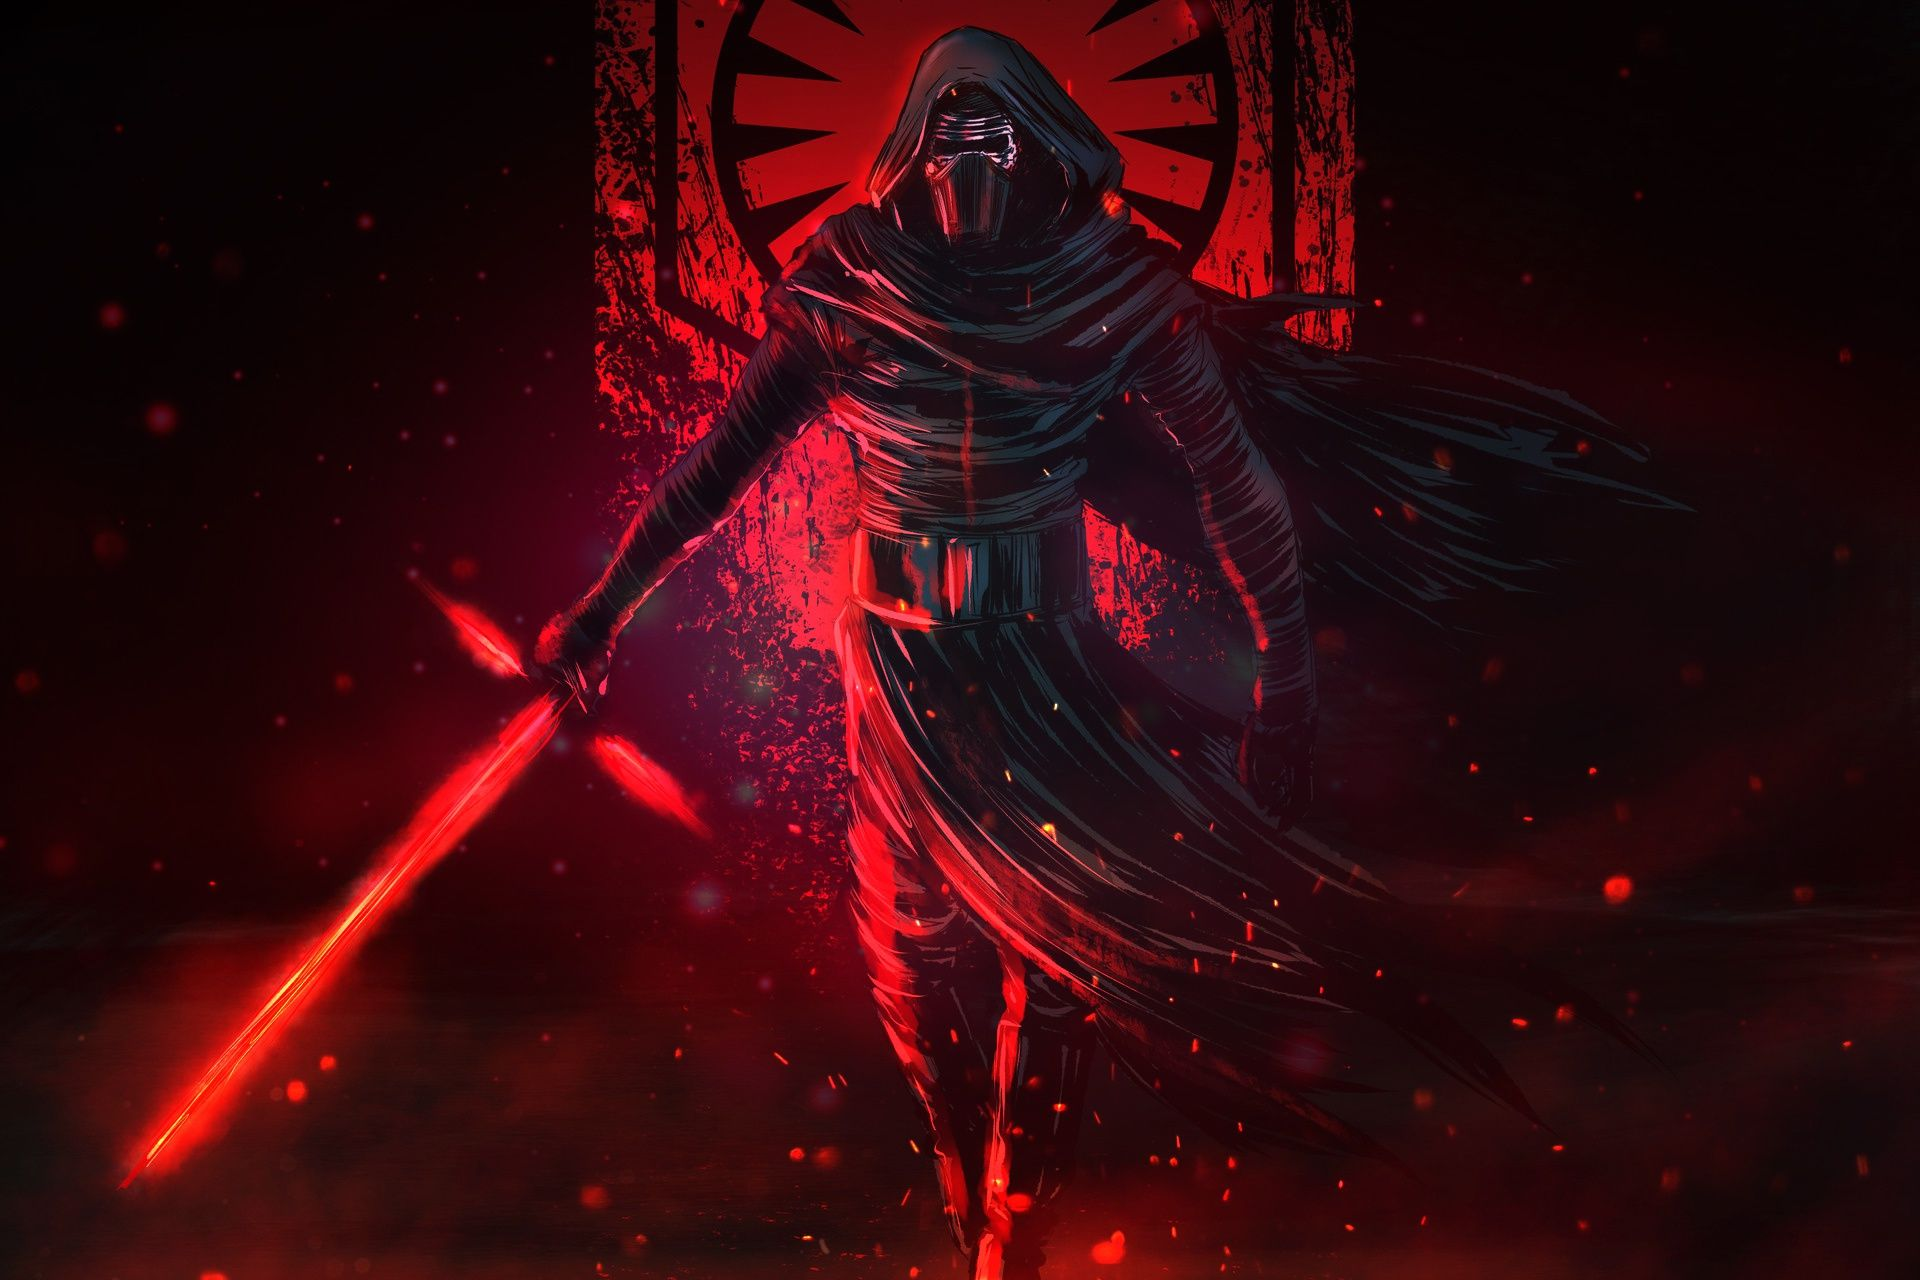 Star Wars Lightsaber Wallpapers Top Free Star Wars Lightsaber Backgrounds Wallpaperaccess